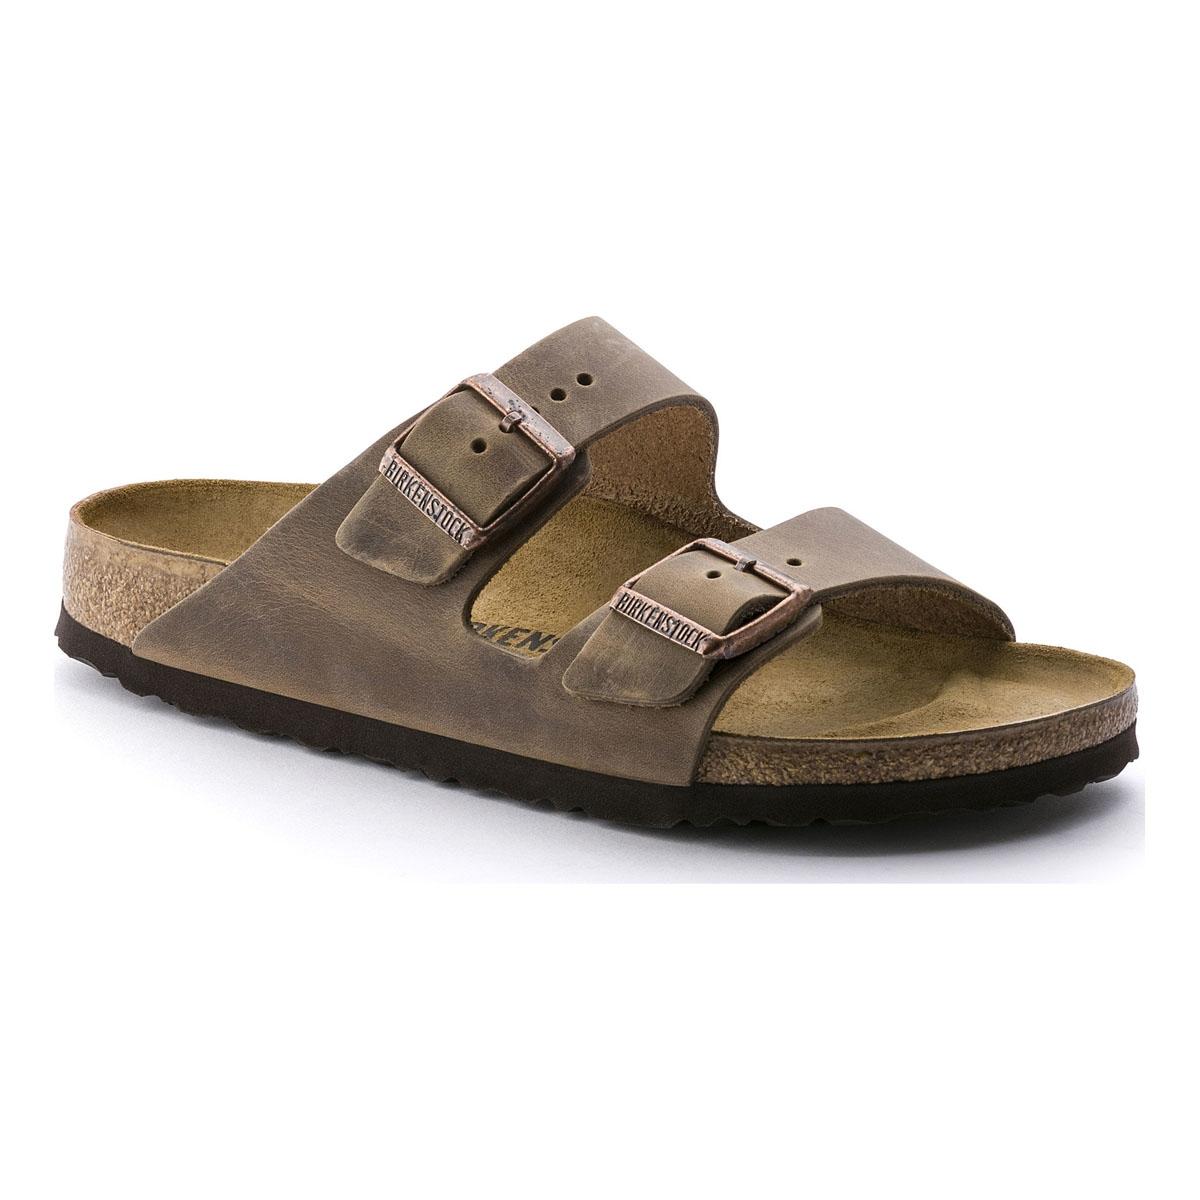 Image of Birkenstock Arizona Oiled Leather Sandals - Tabacco Brown 64b0f3294